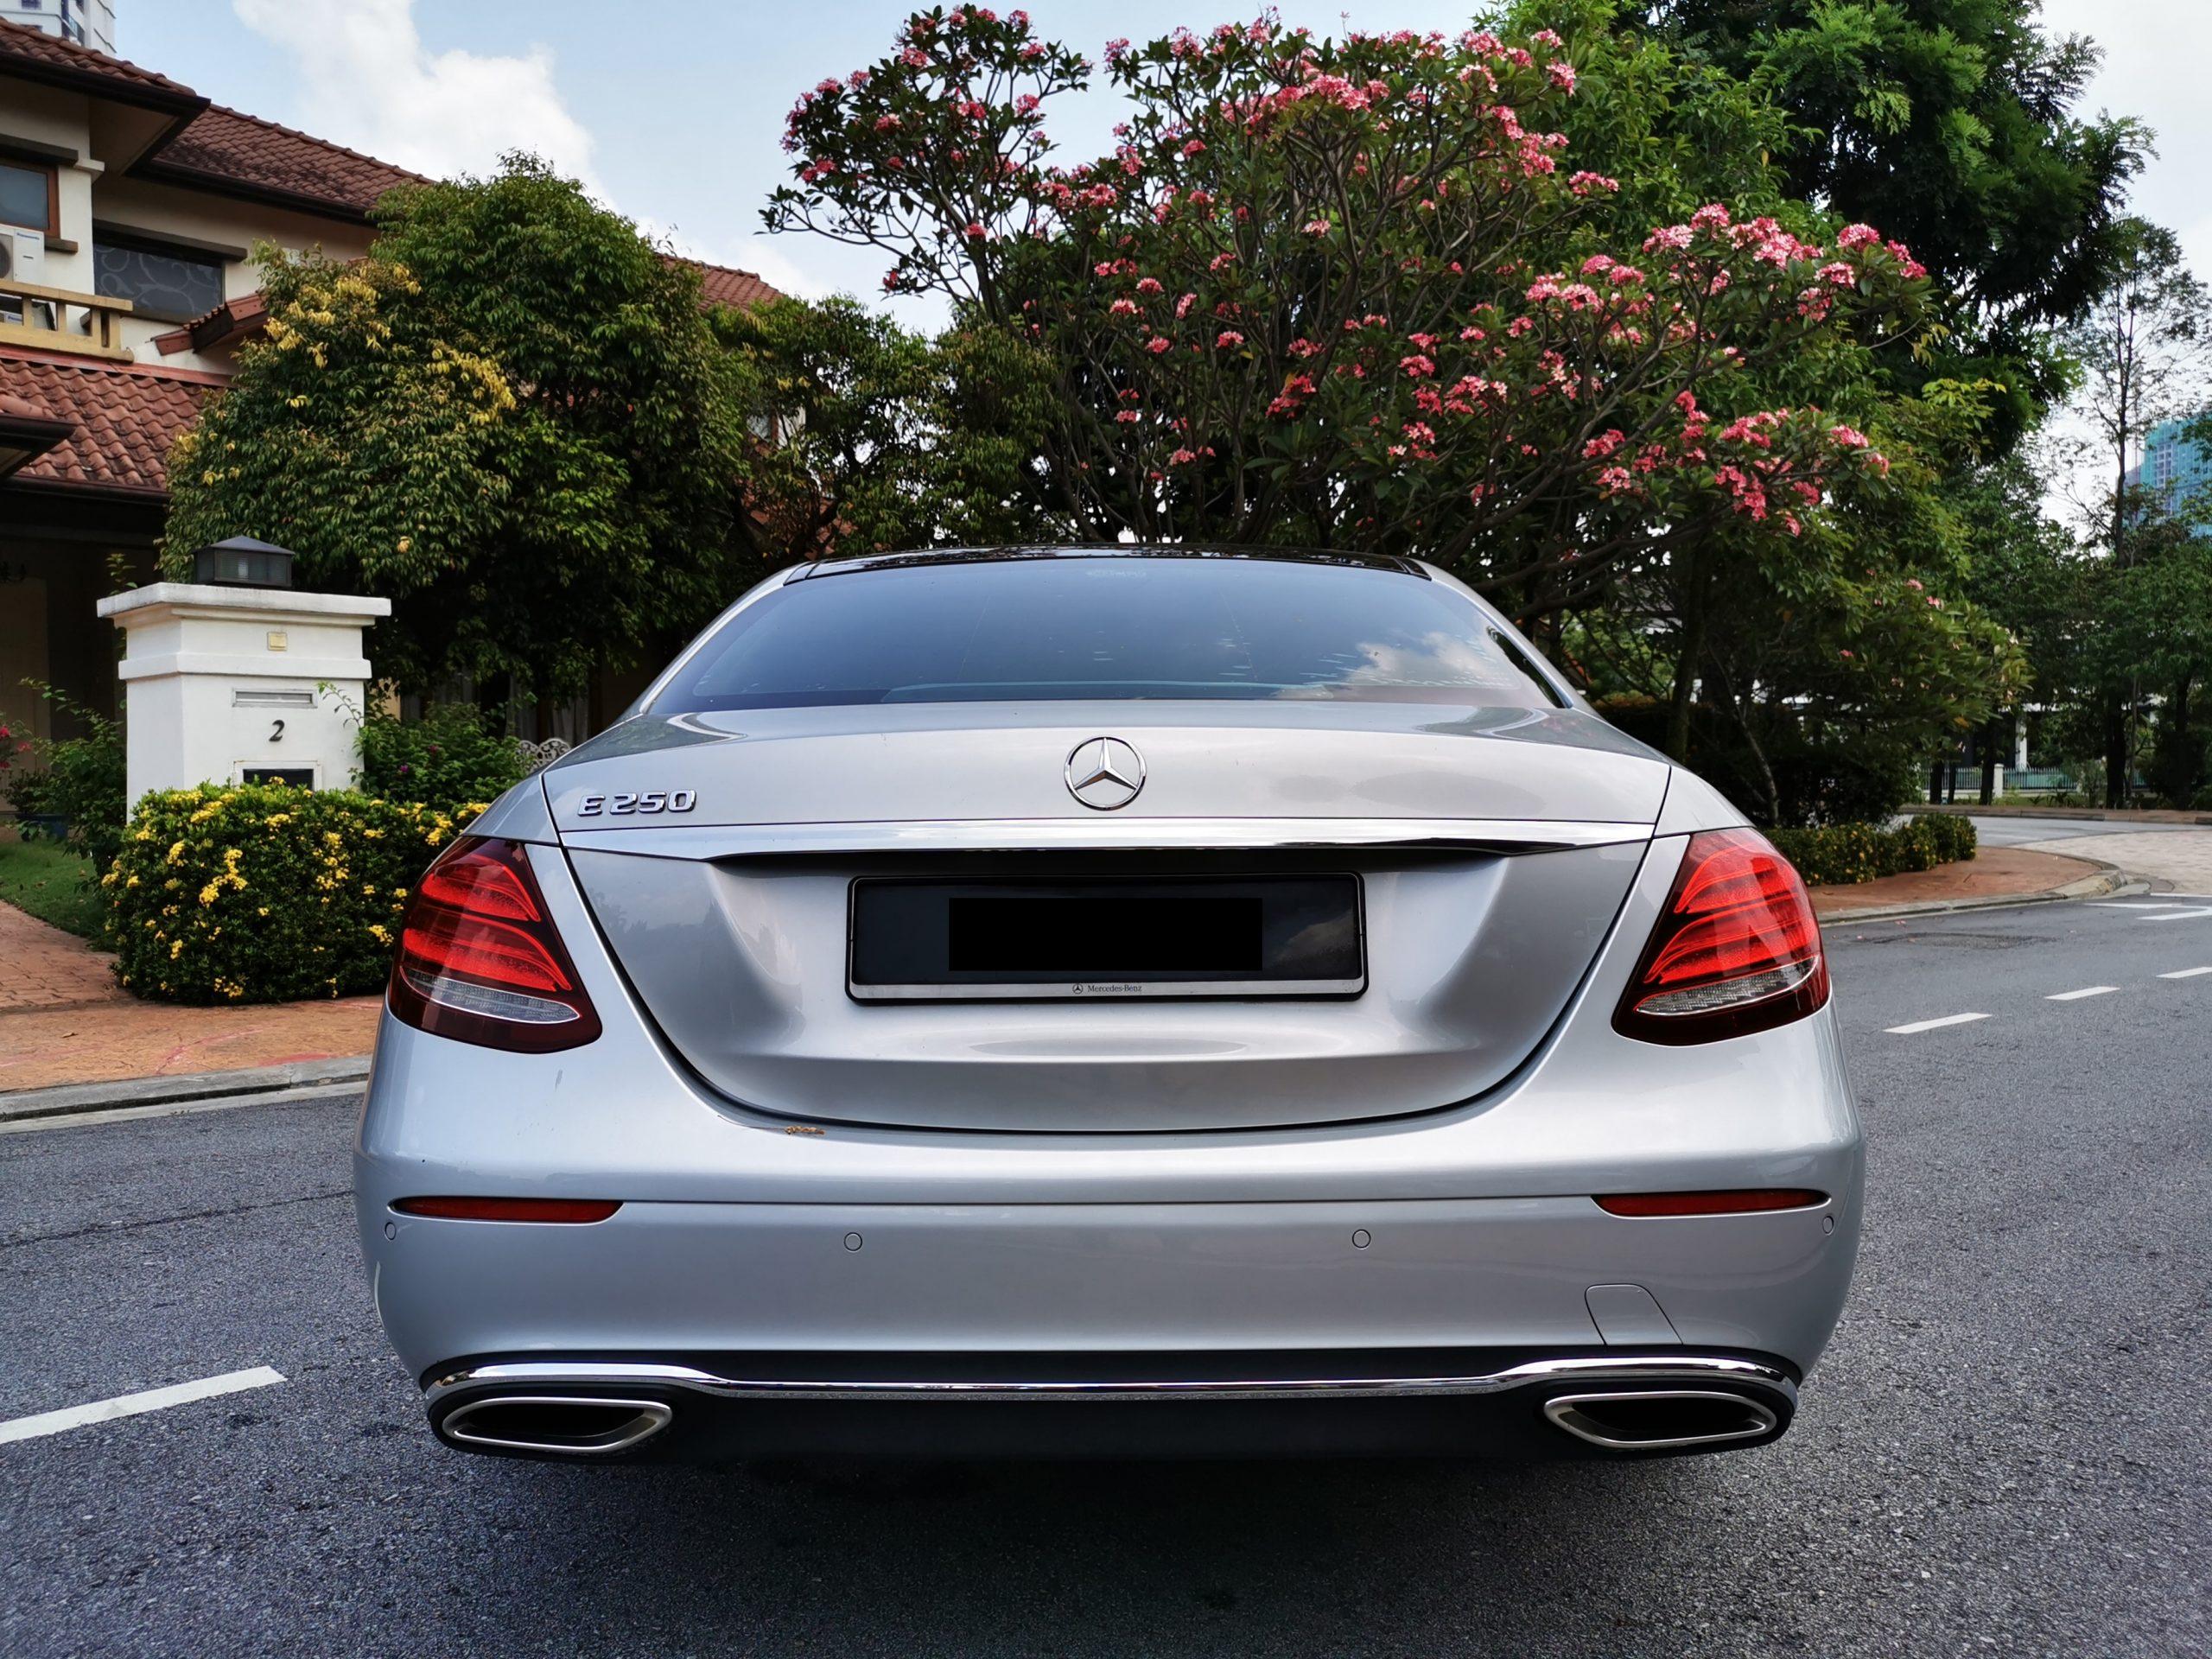 Mercedes E250 rear view